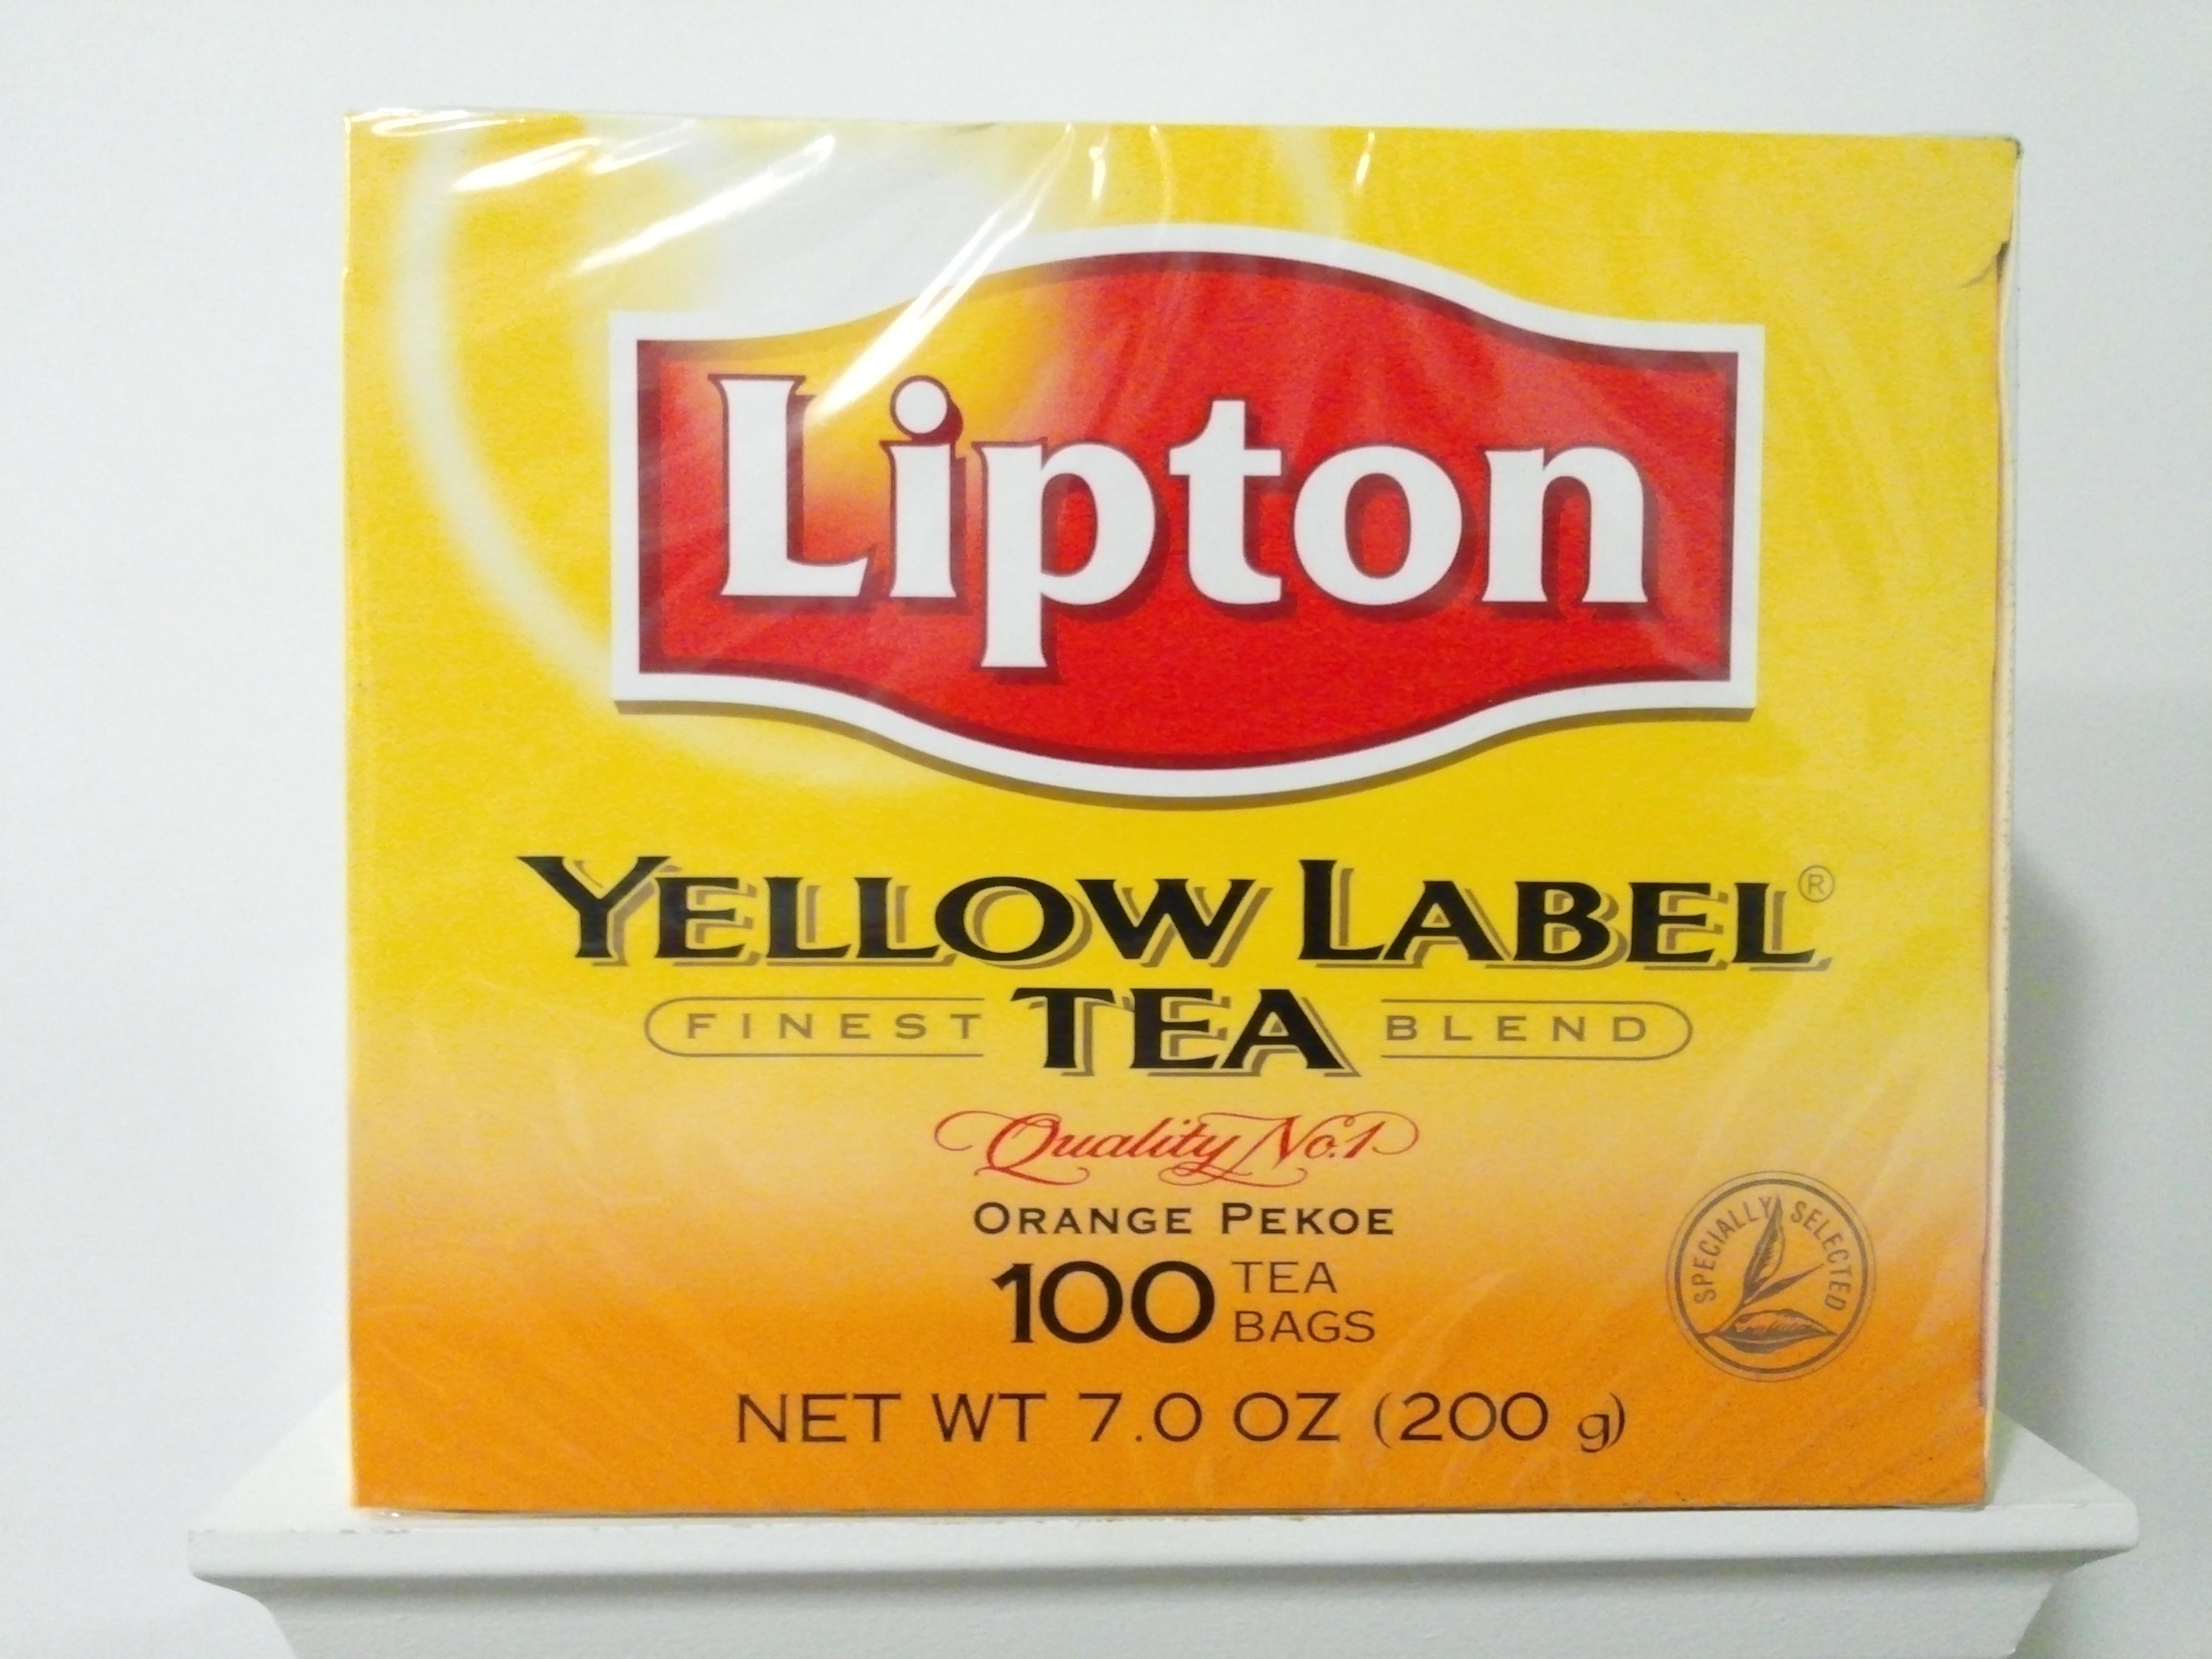 Lipton Yellow Label Tea 100 Bags